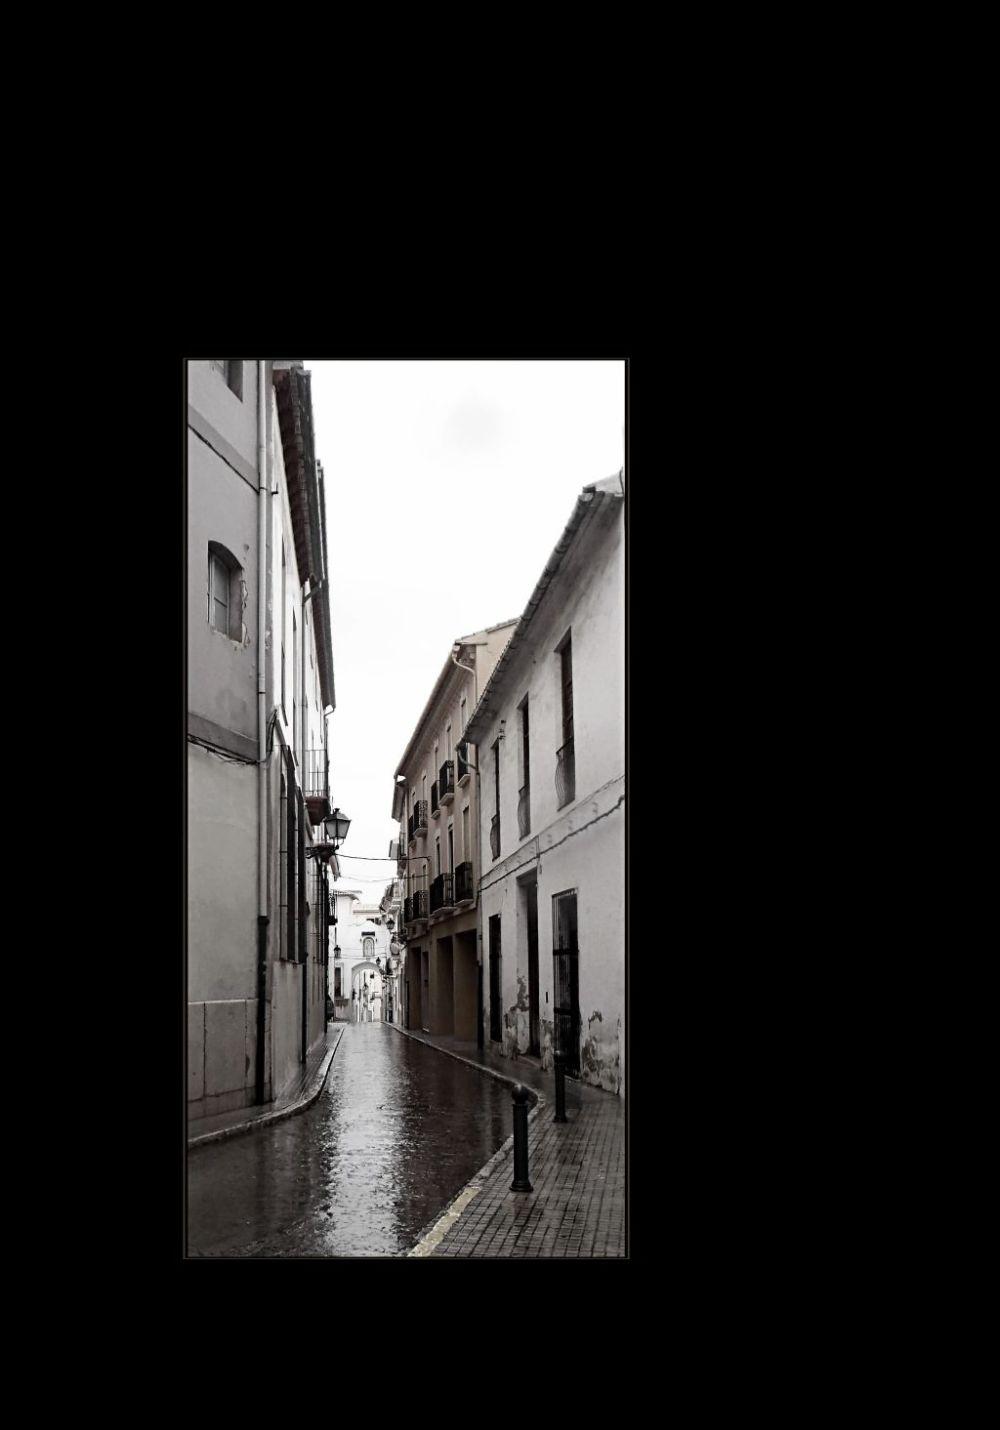 On a Rainy Day in Oliva